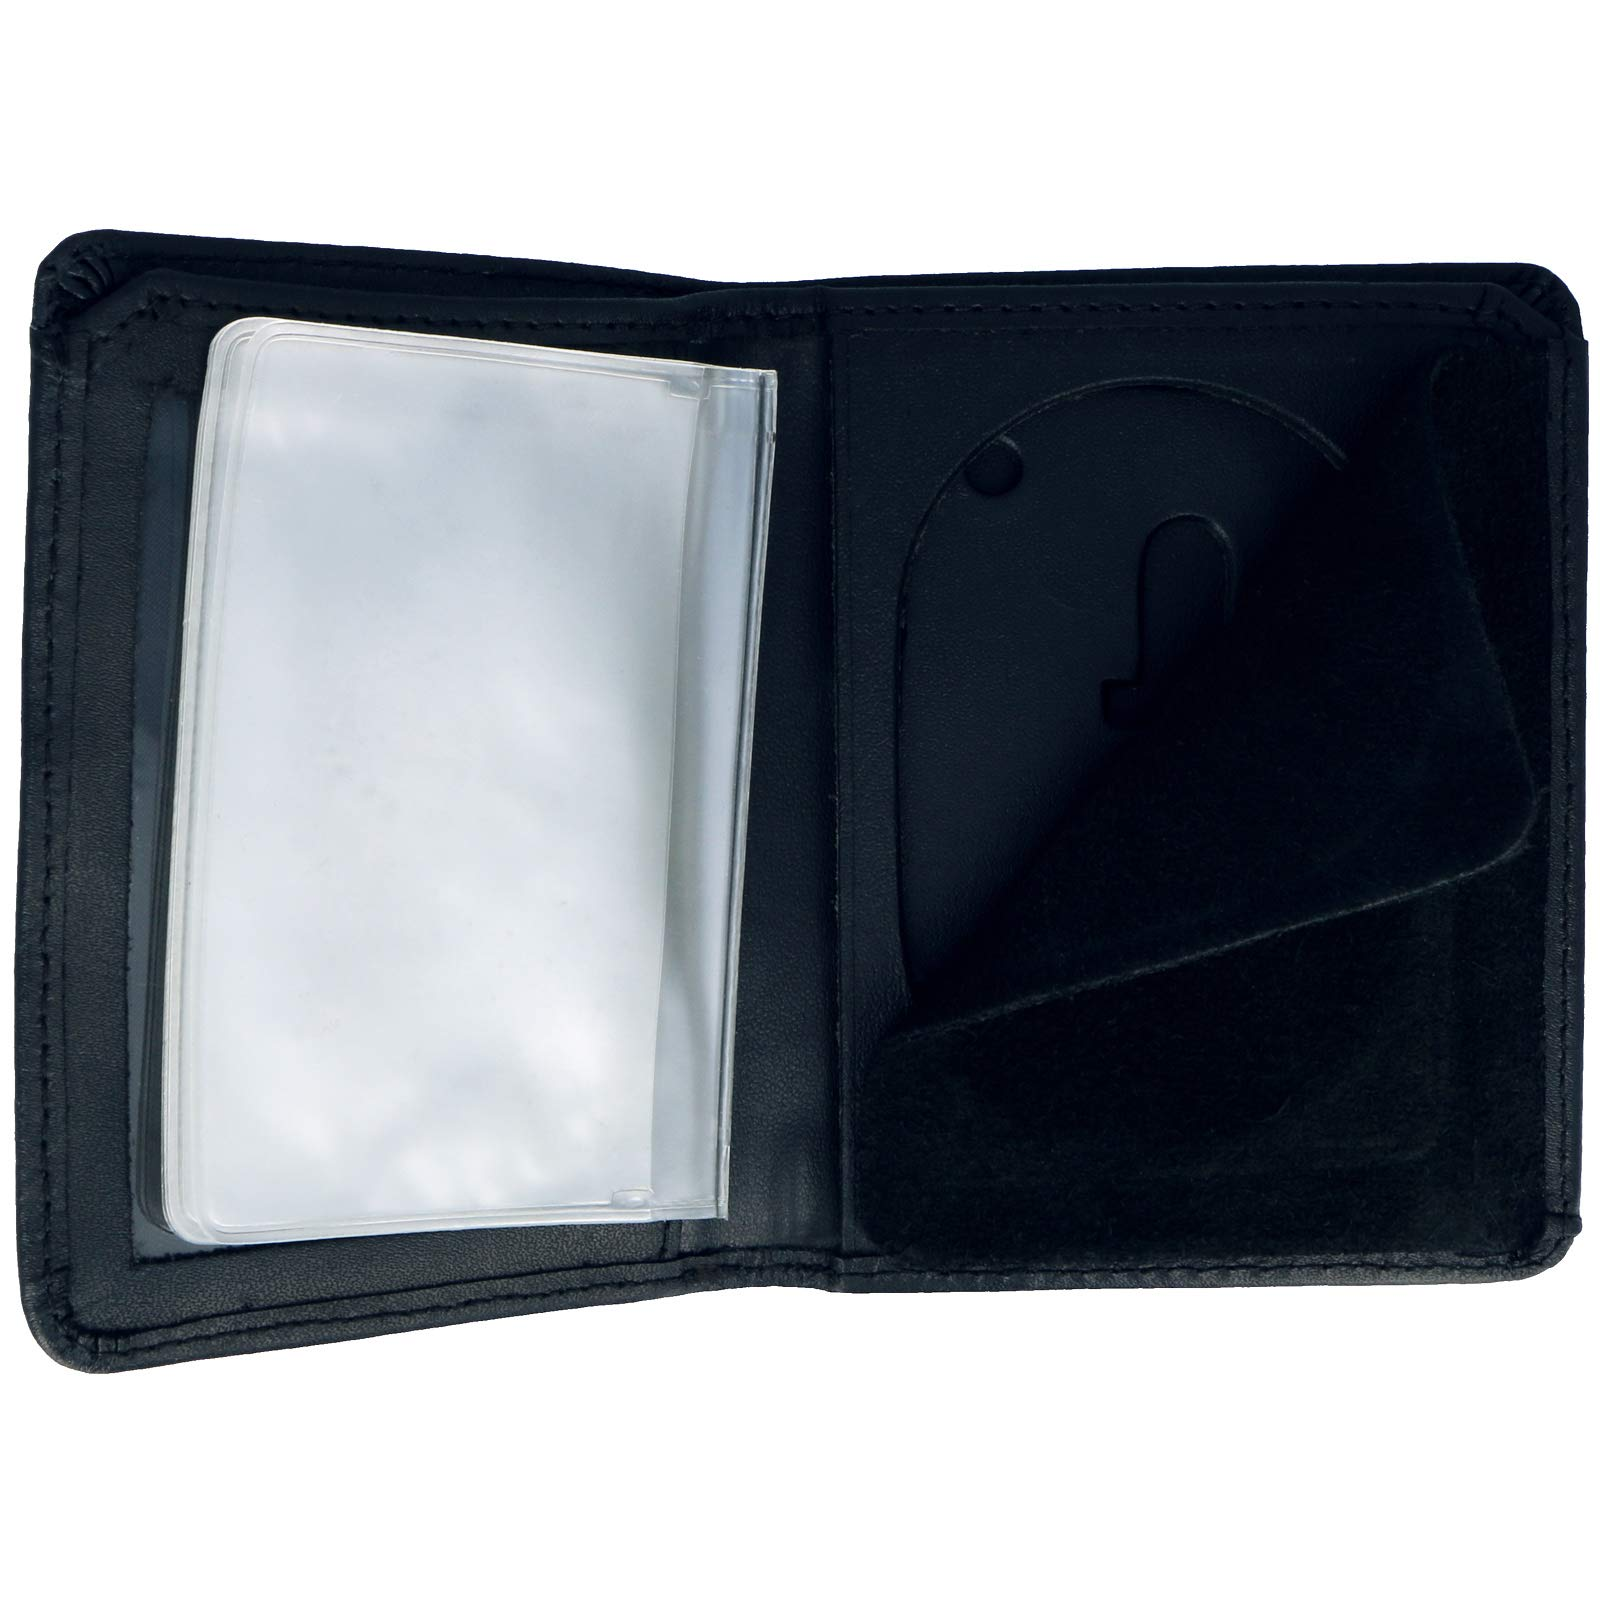 Genuine Leather Unisex Law Enforcement Badge Holder Wallet Case - Oval by ASR Federal